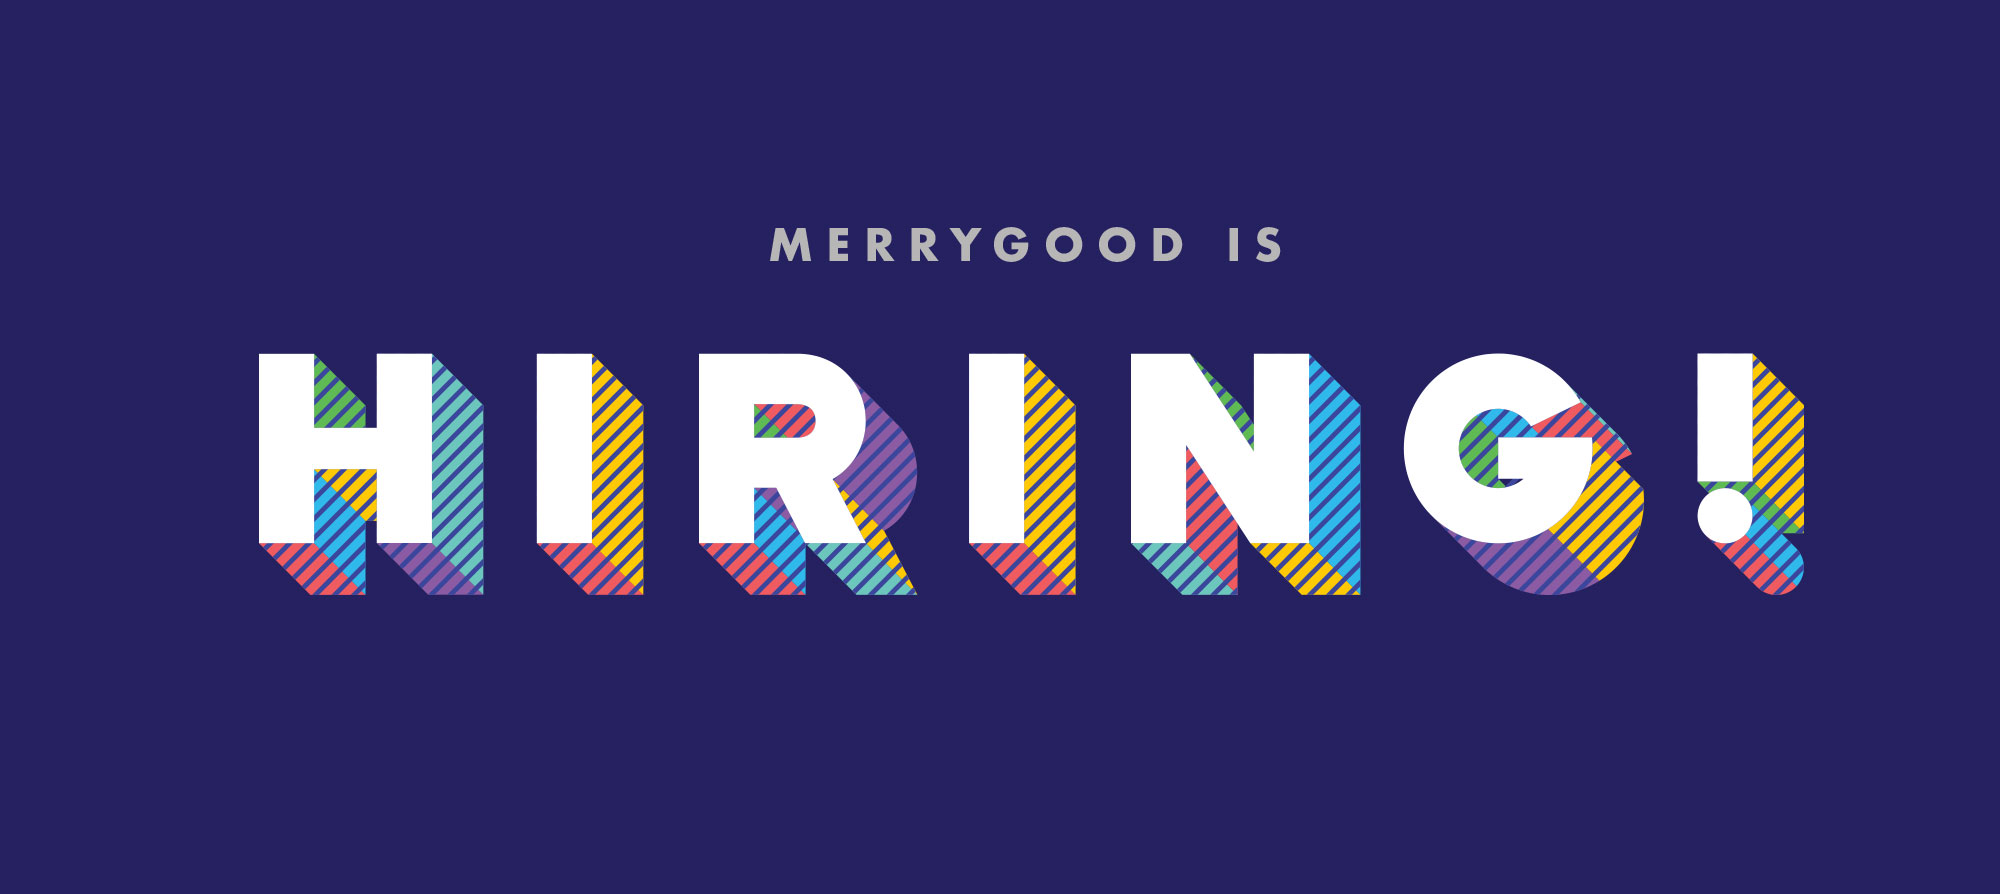 merrygood-hiring-austin-creative.jpg